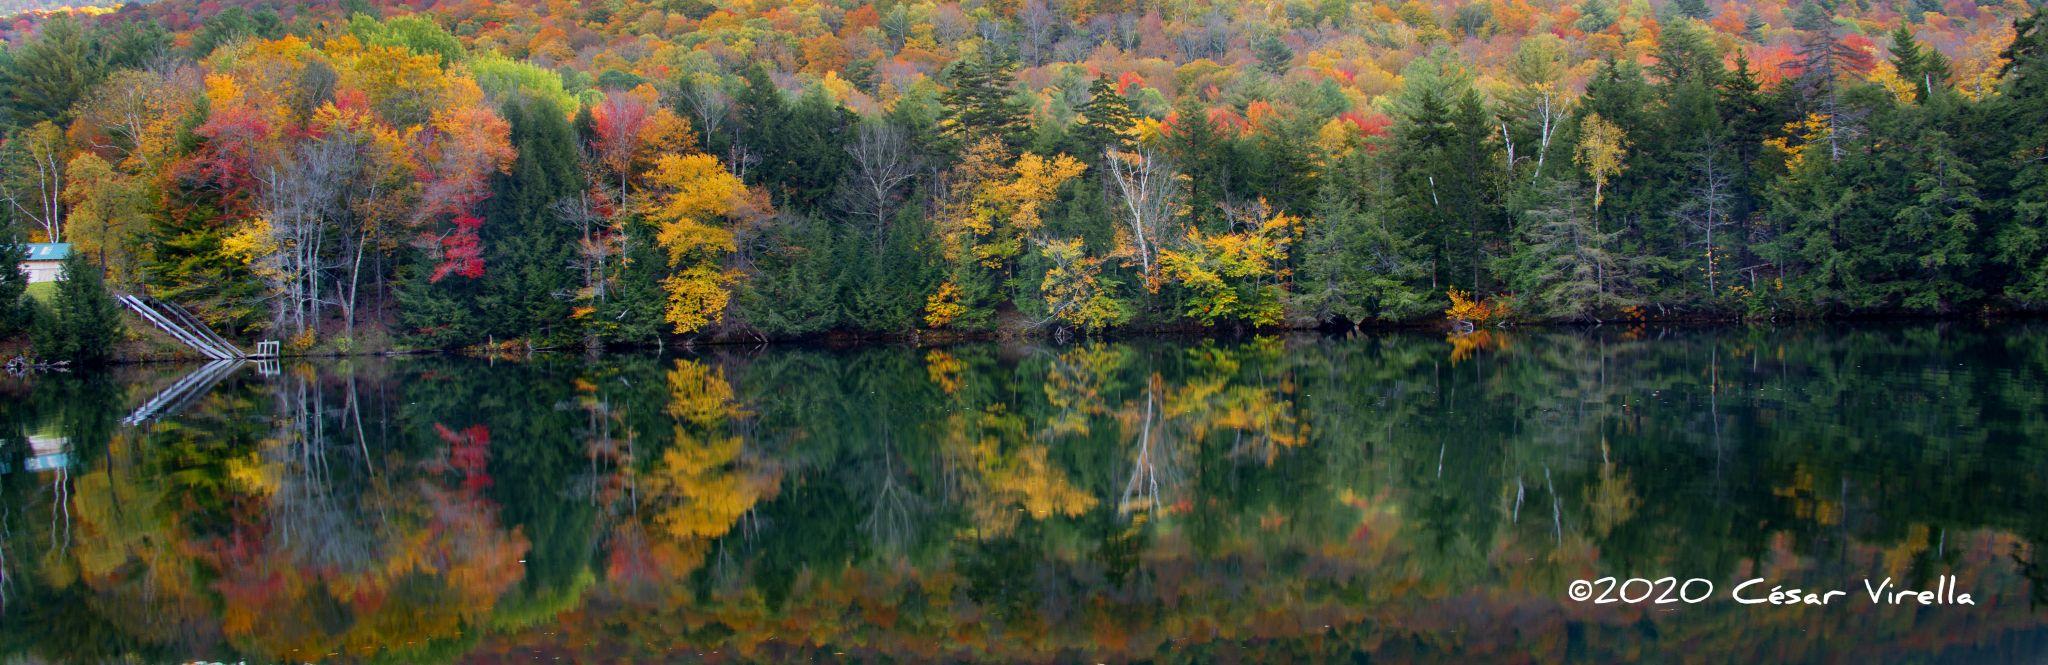 Woodward Reservoir near Plymouth Vt, USA